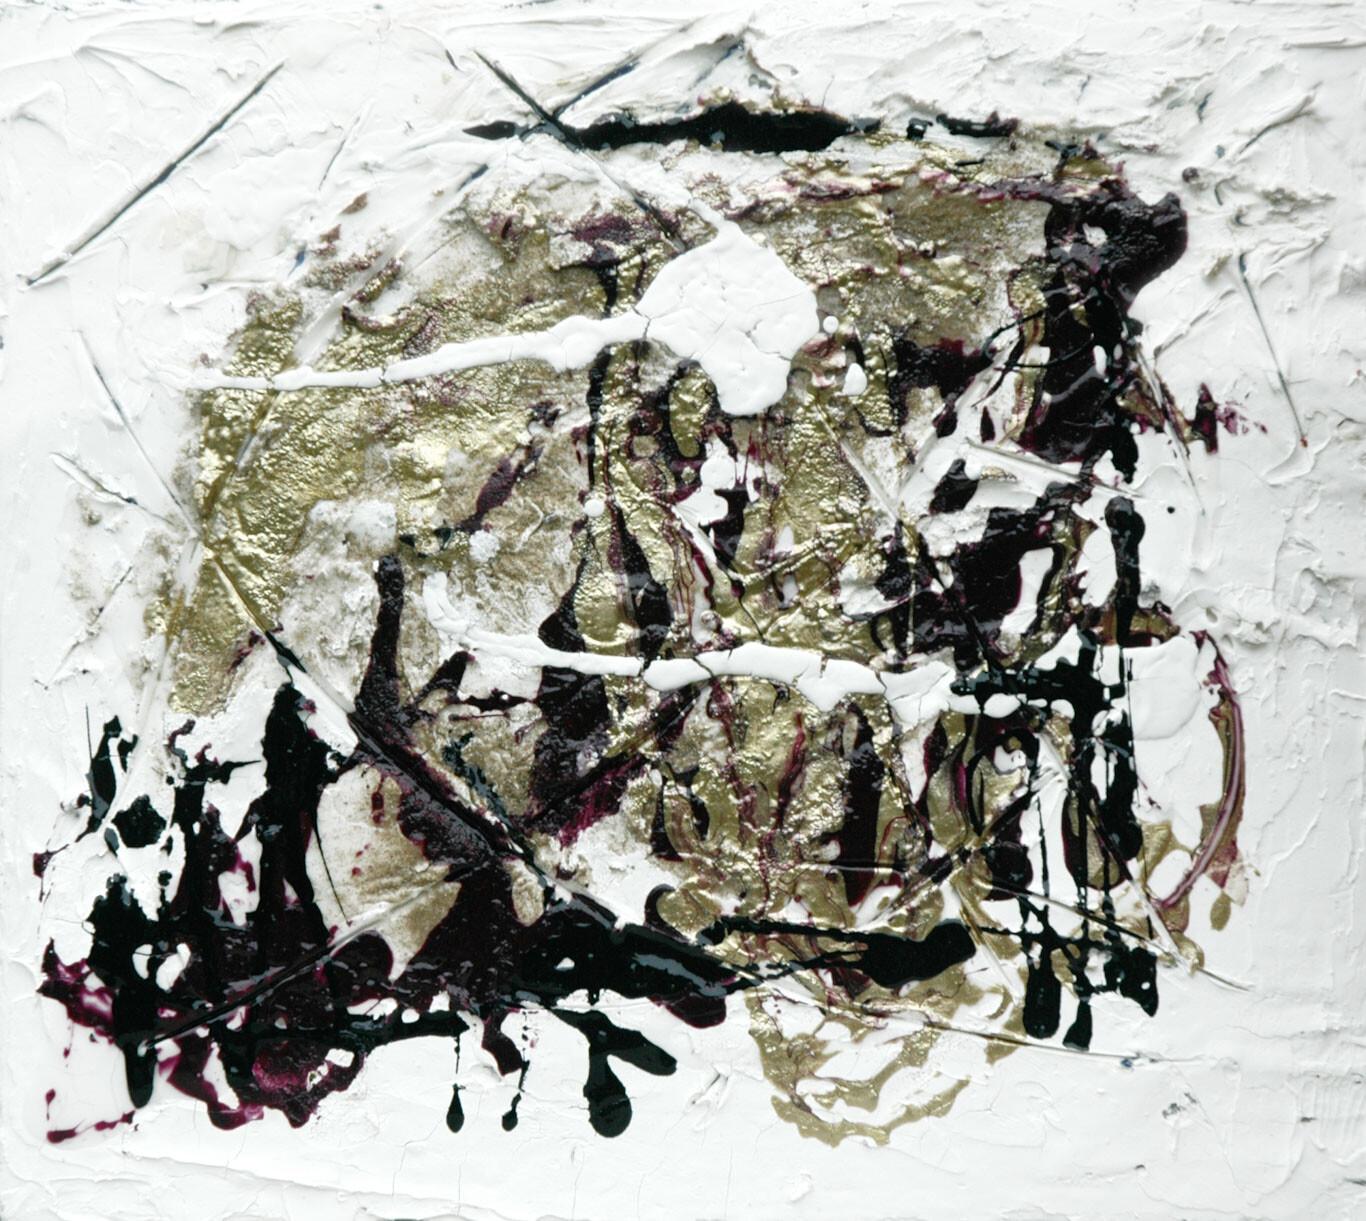 Sottopelle #3 25 x 25 trittico varnish plaster sand on wood